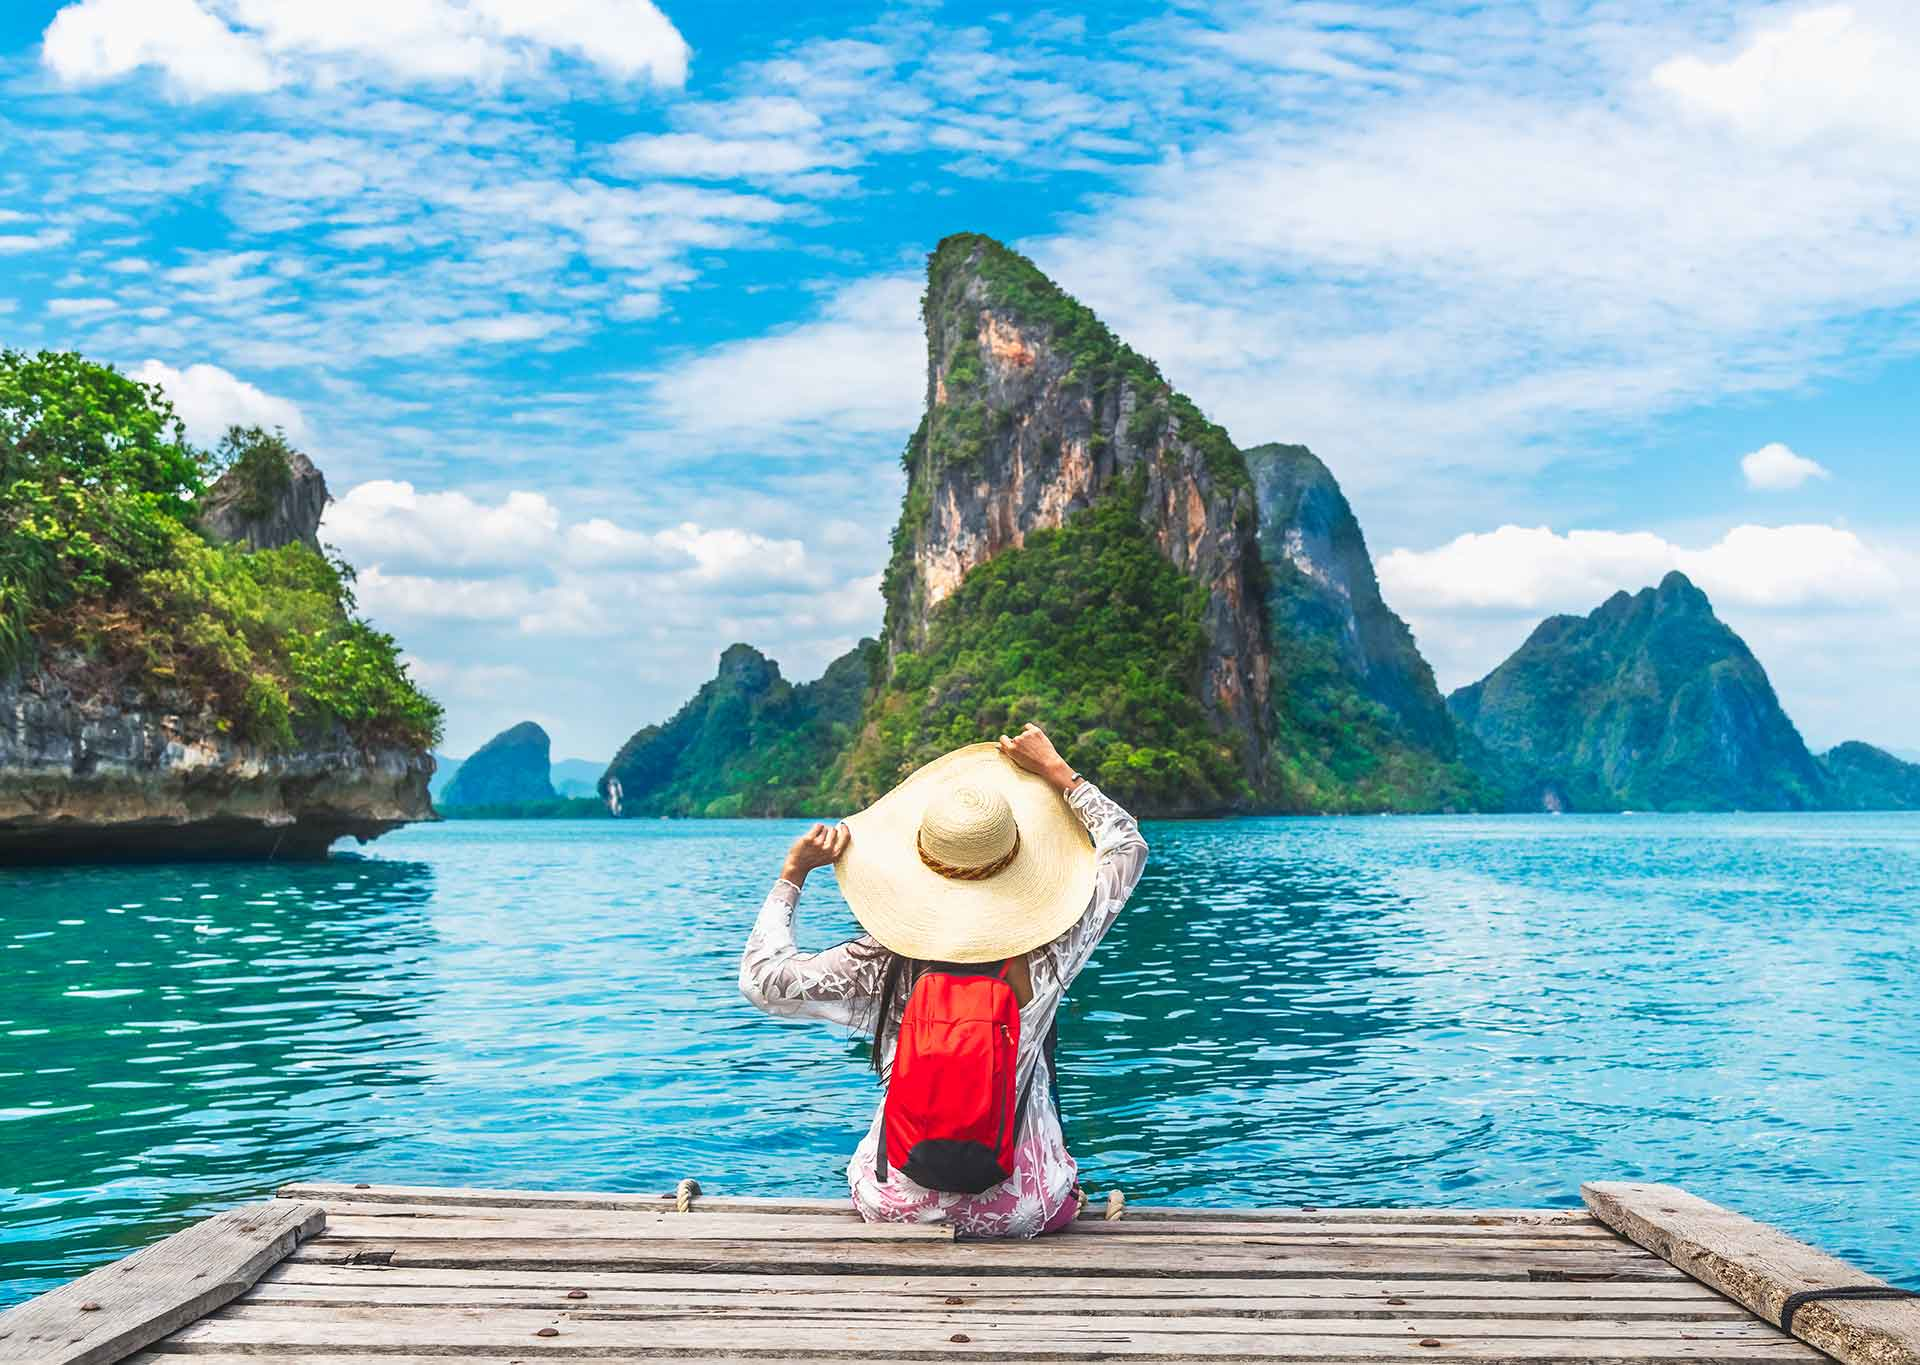 Ligarba Travel Tourism Services